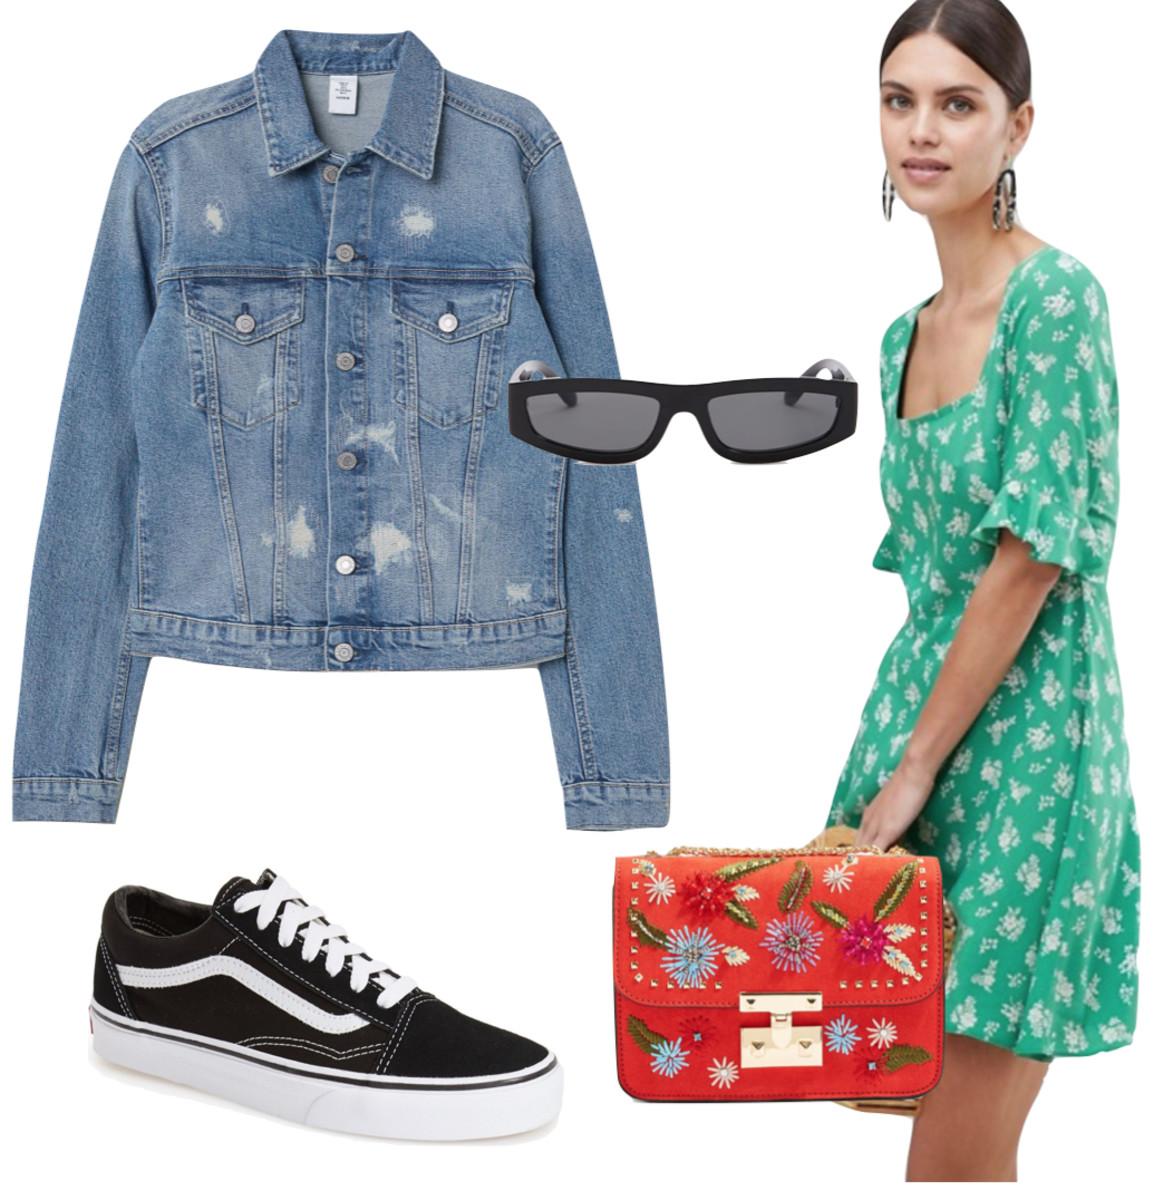 green-emerald-dress-mini-floral-print-red-bag-black-shoe-sneakers-blue-med-jacket-jean-sun-spring-summer-lunch.jpg